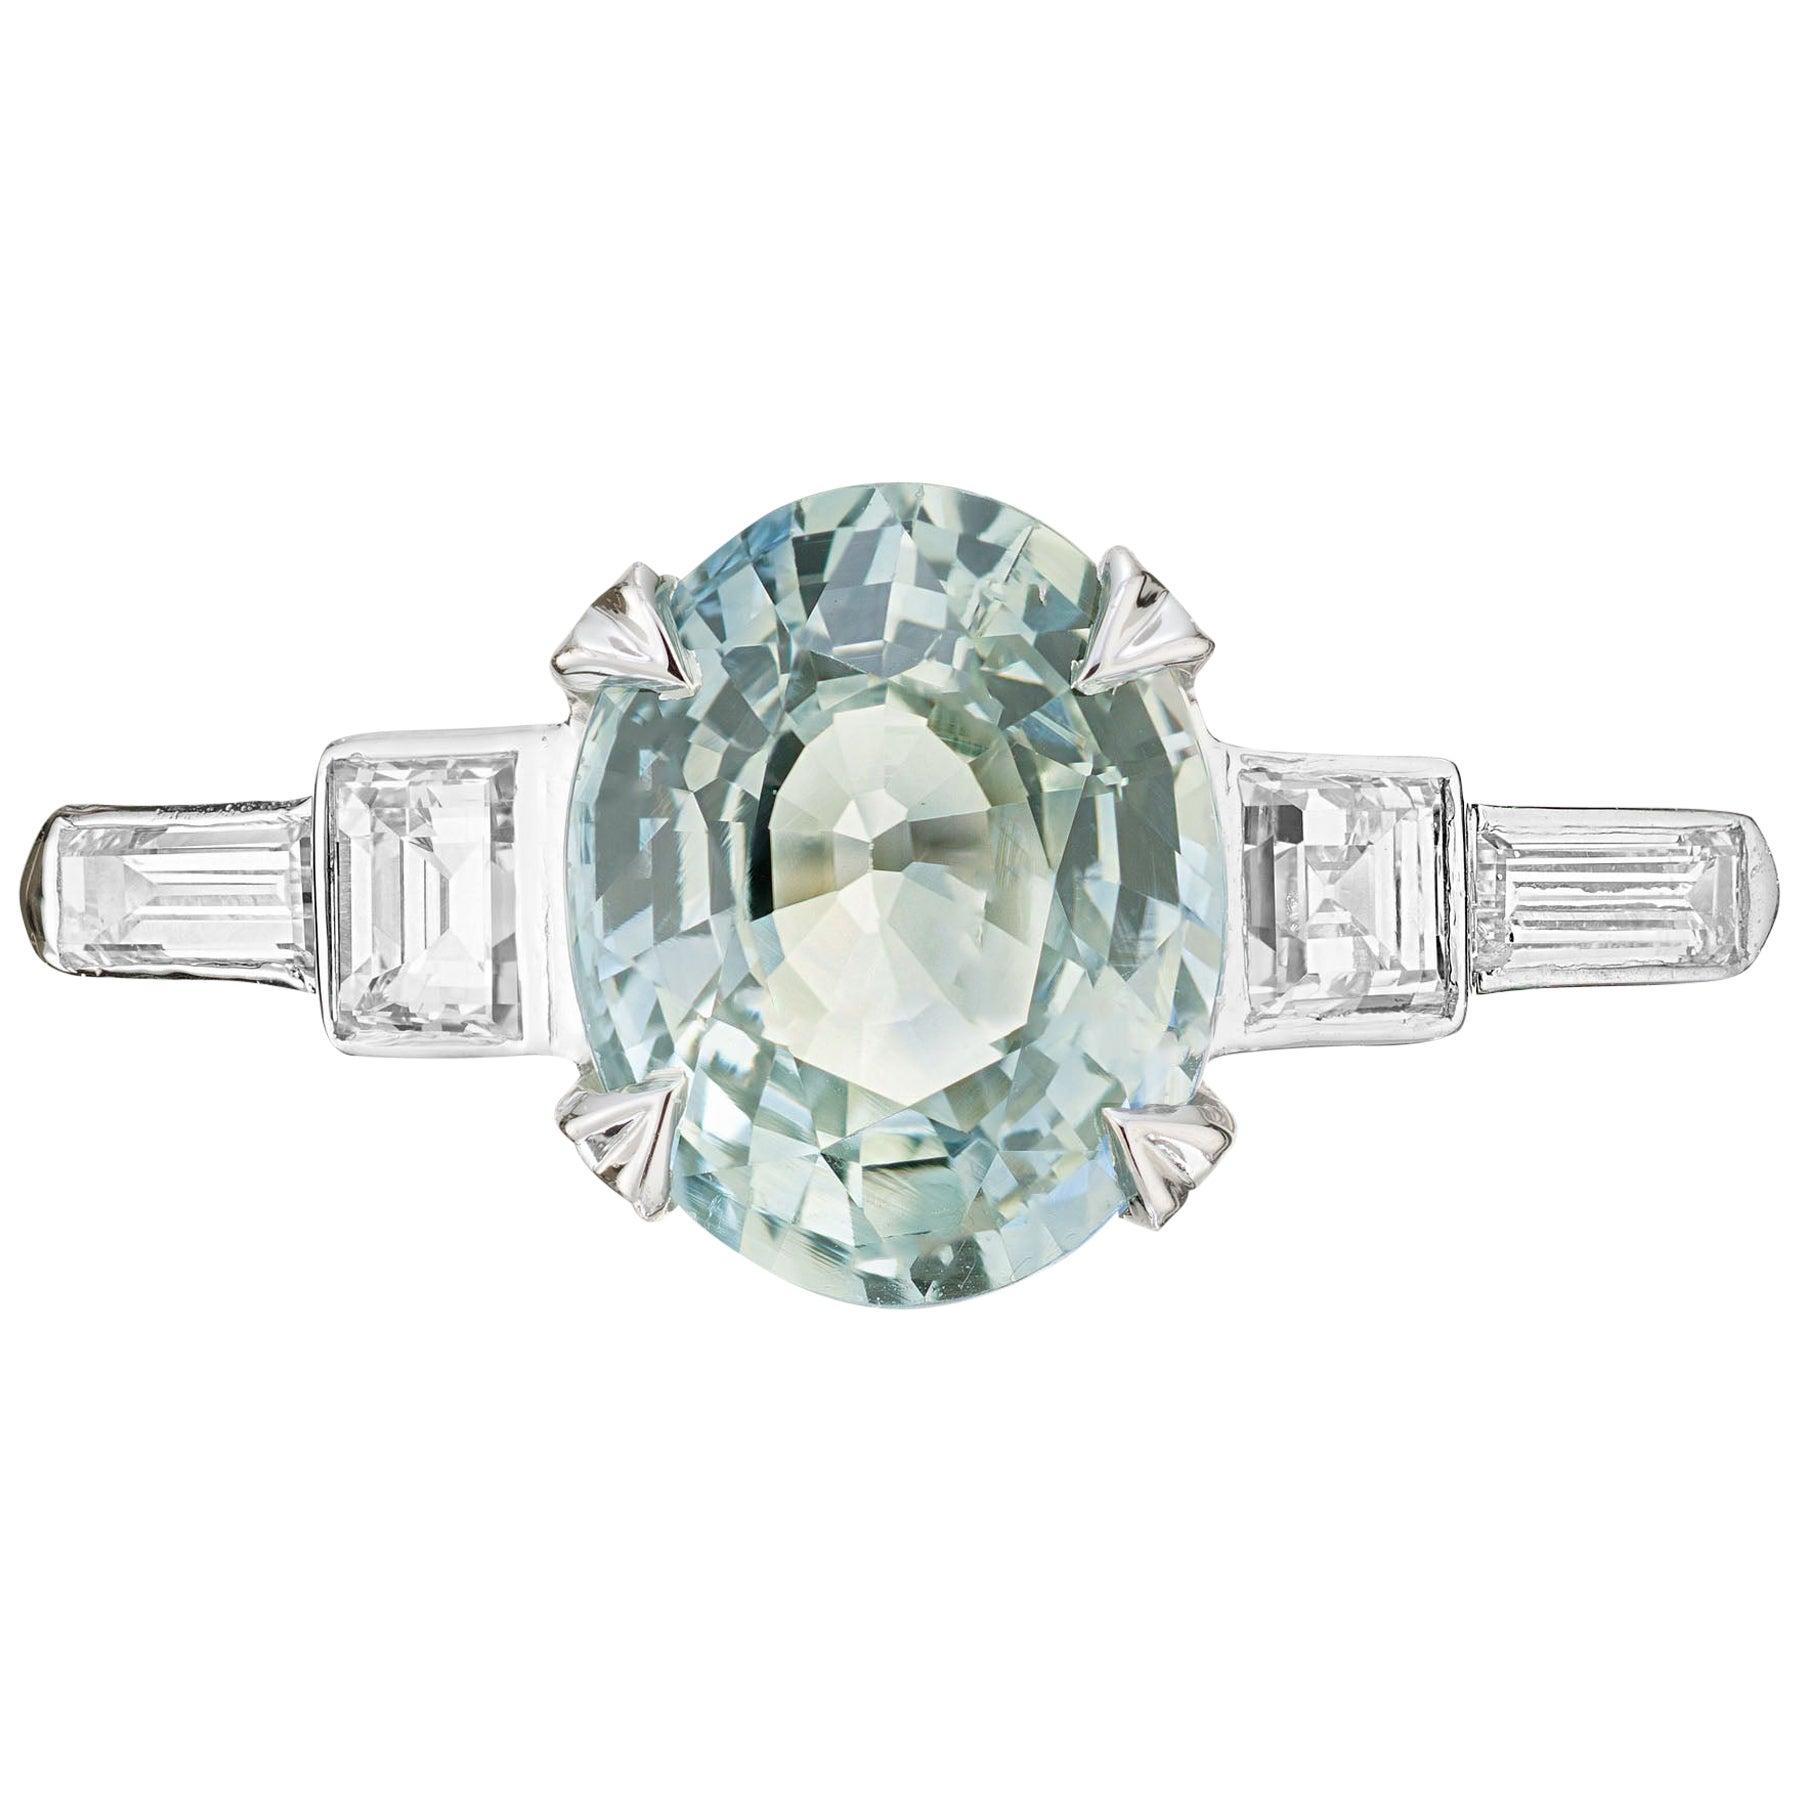 GIA Certified 2.48 Carat Sapphire Diamond Platinum Engagement Ring